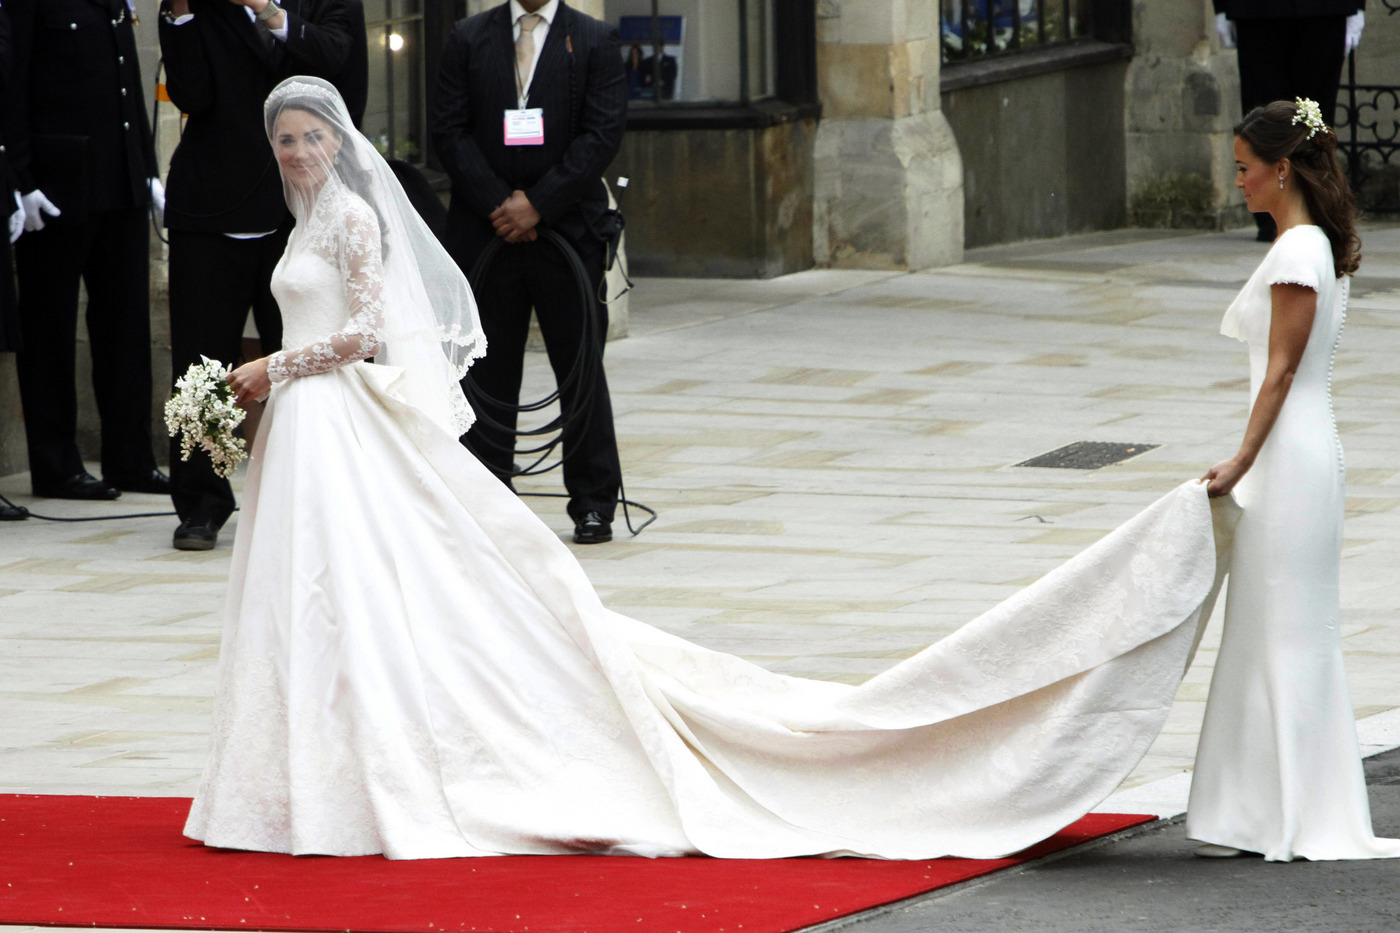 Mina + Oli: Kate Middleton's Wedding Dress